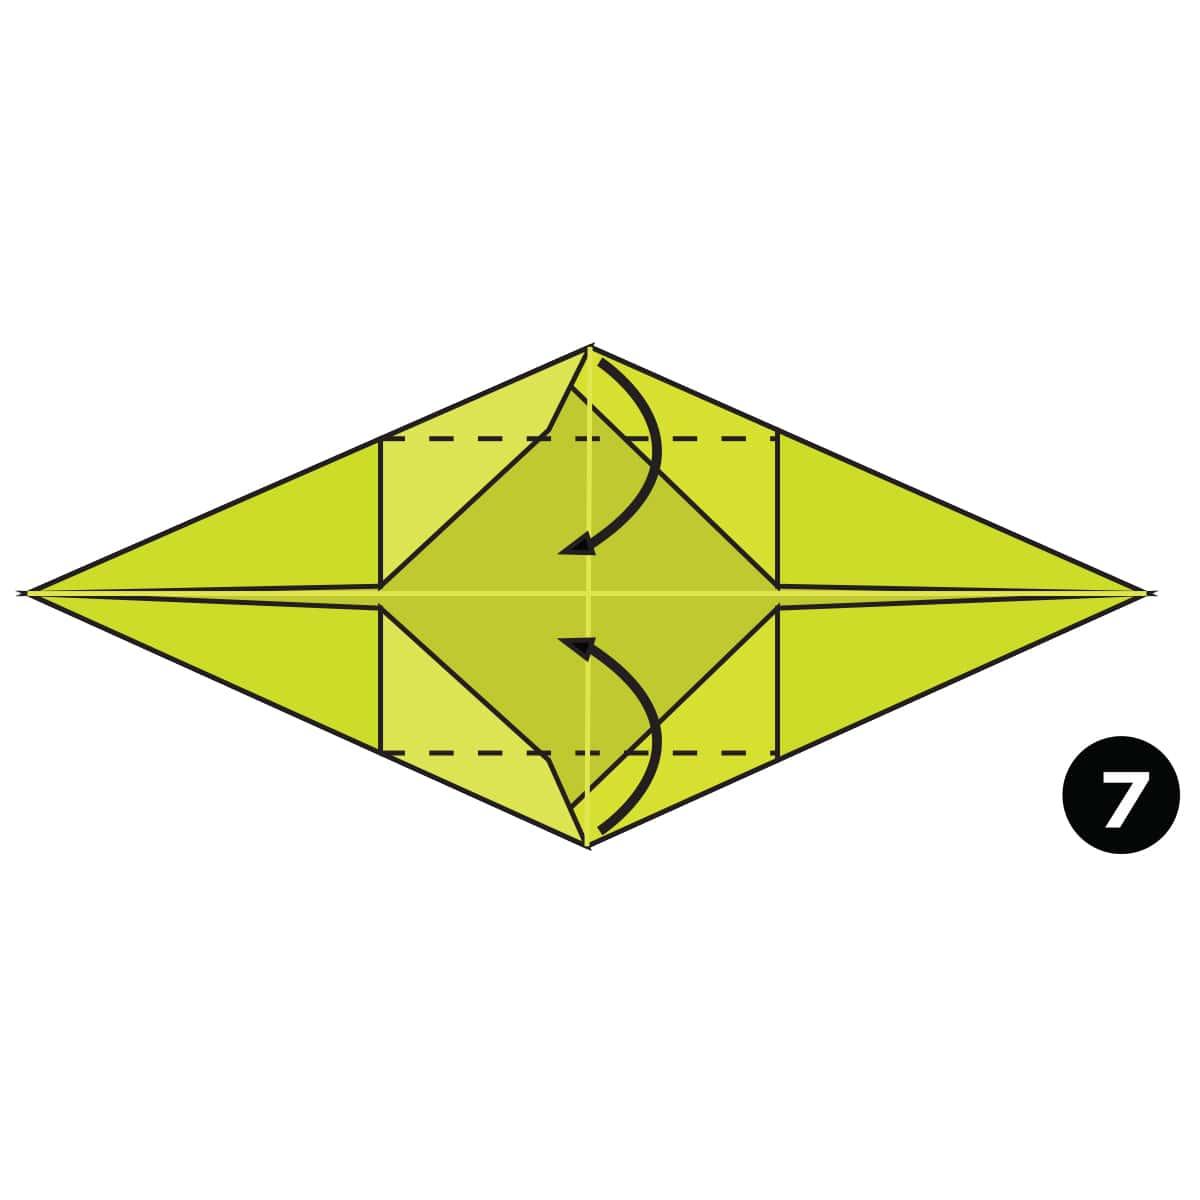 Crocodile Step 7